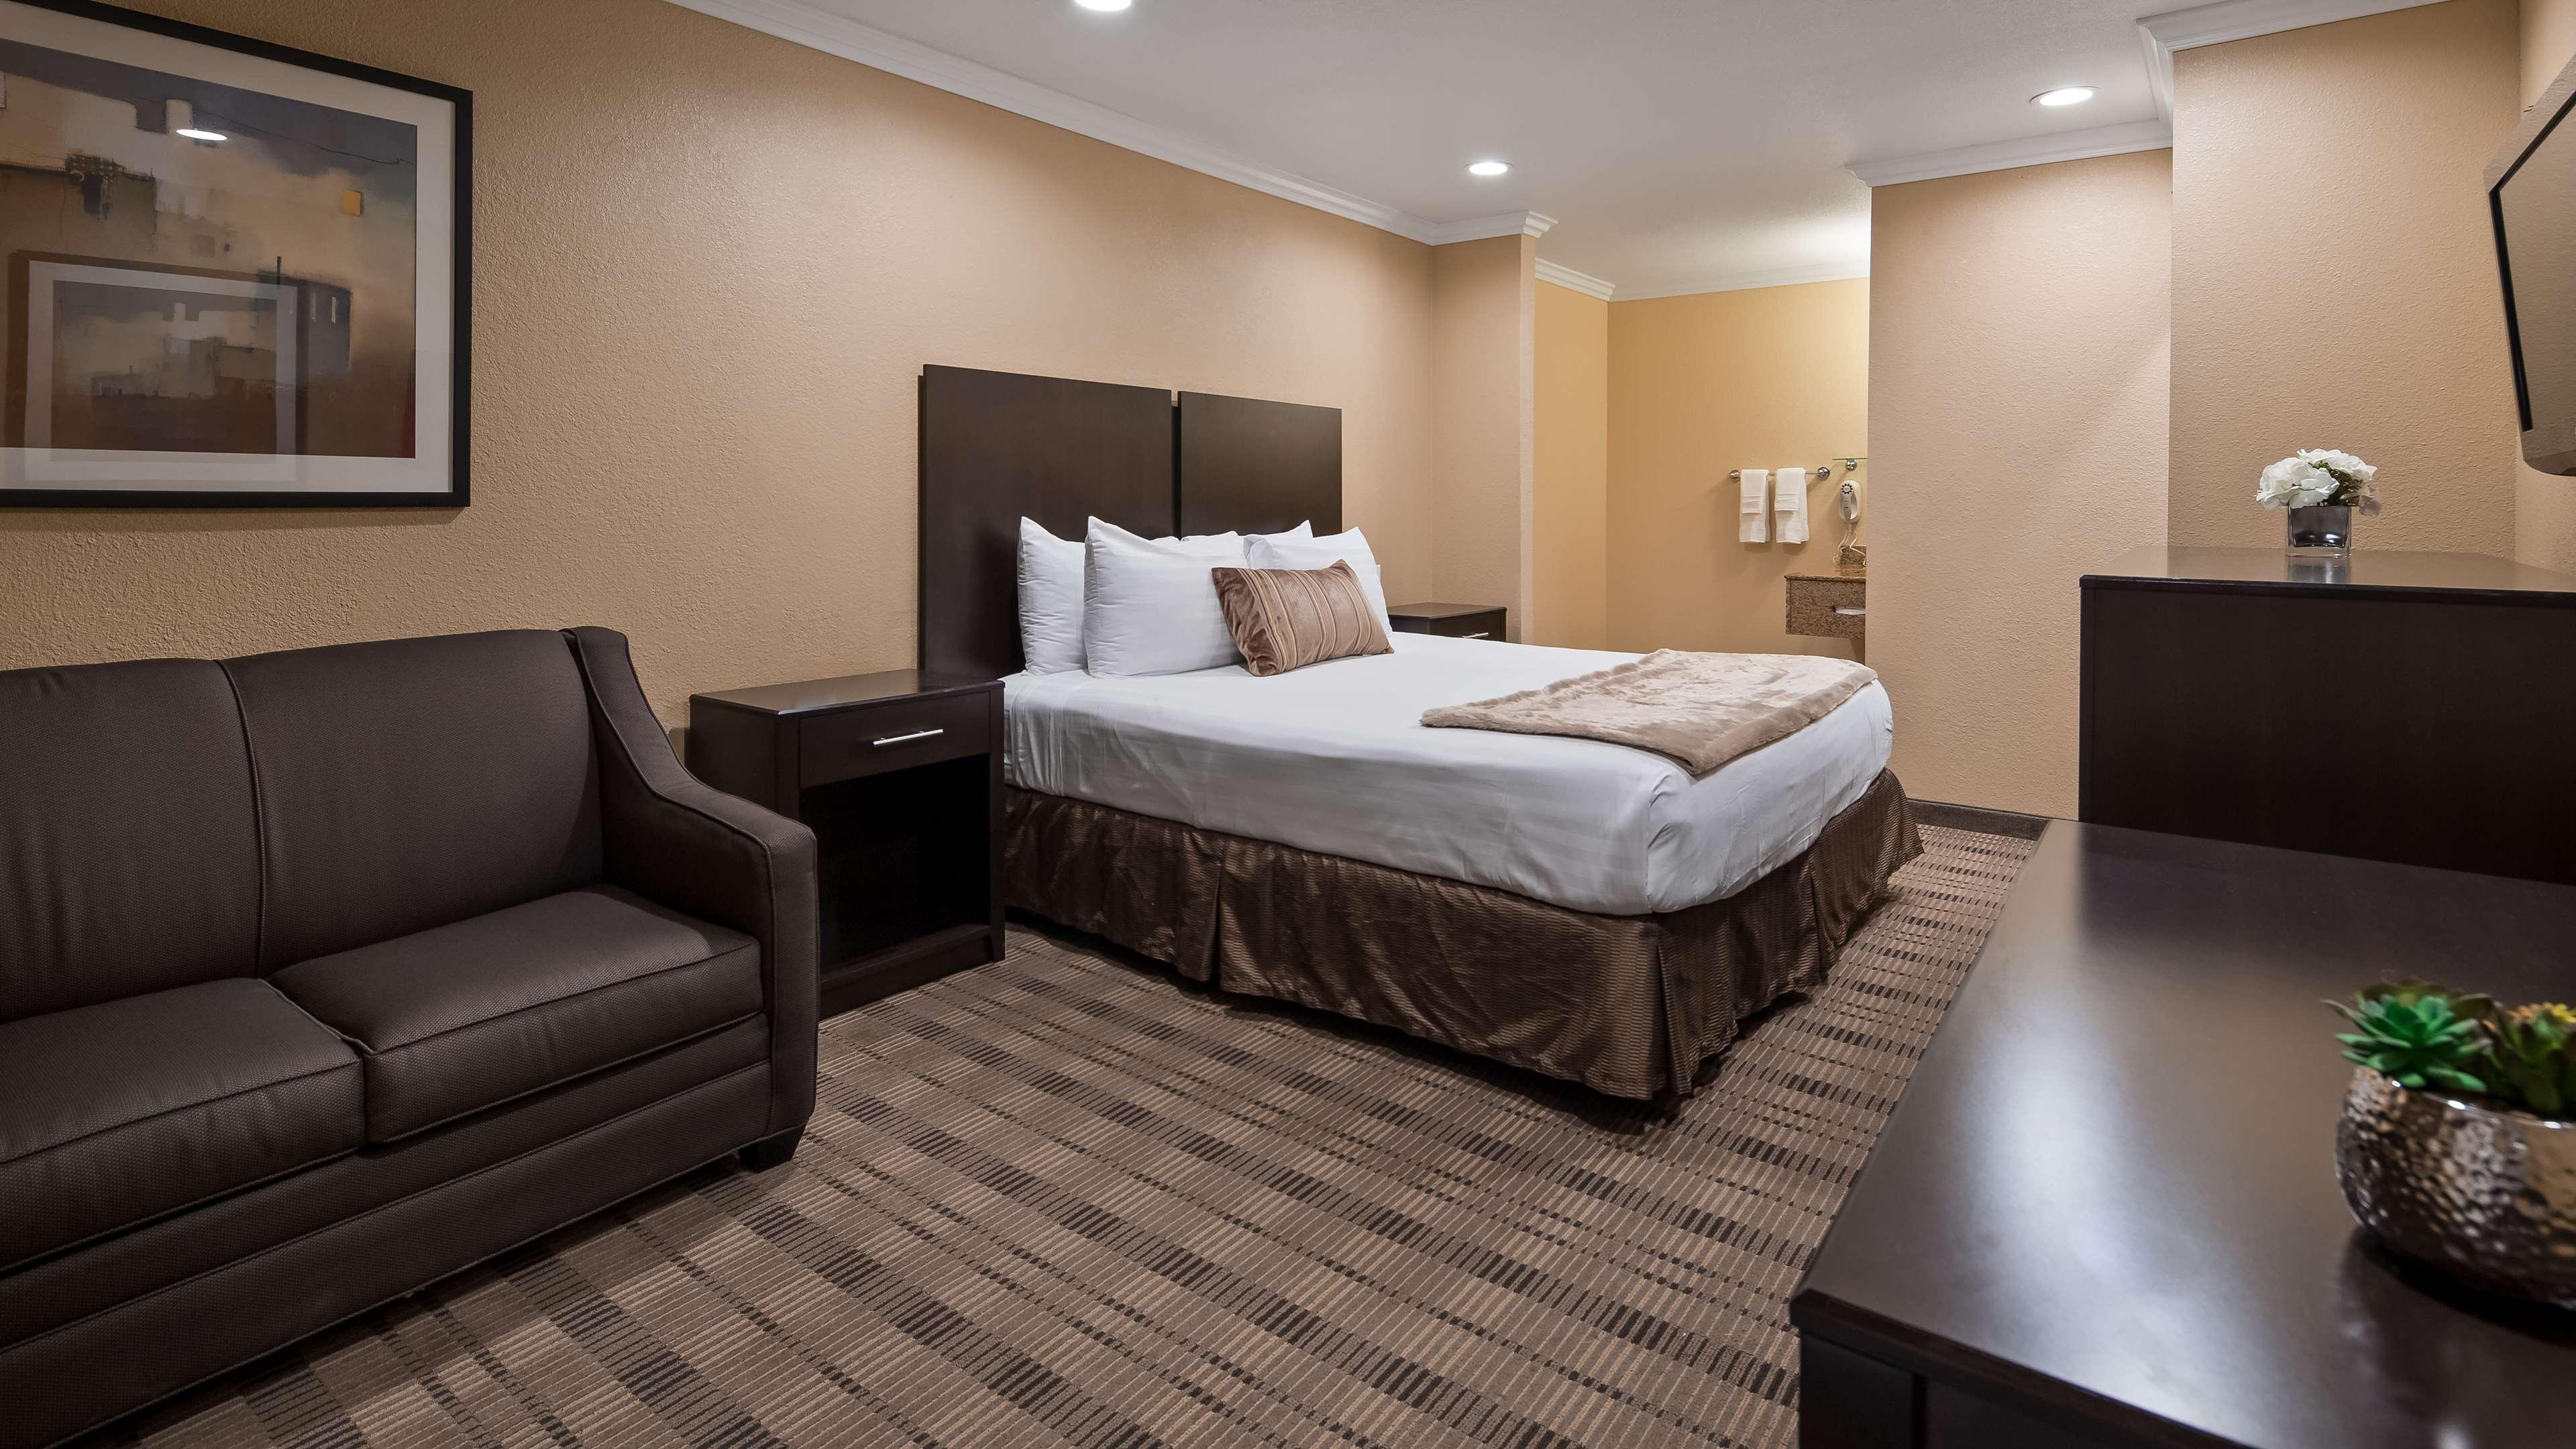 Best Western Poway/San Diego Hotel image 8